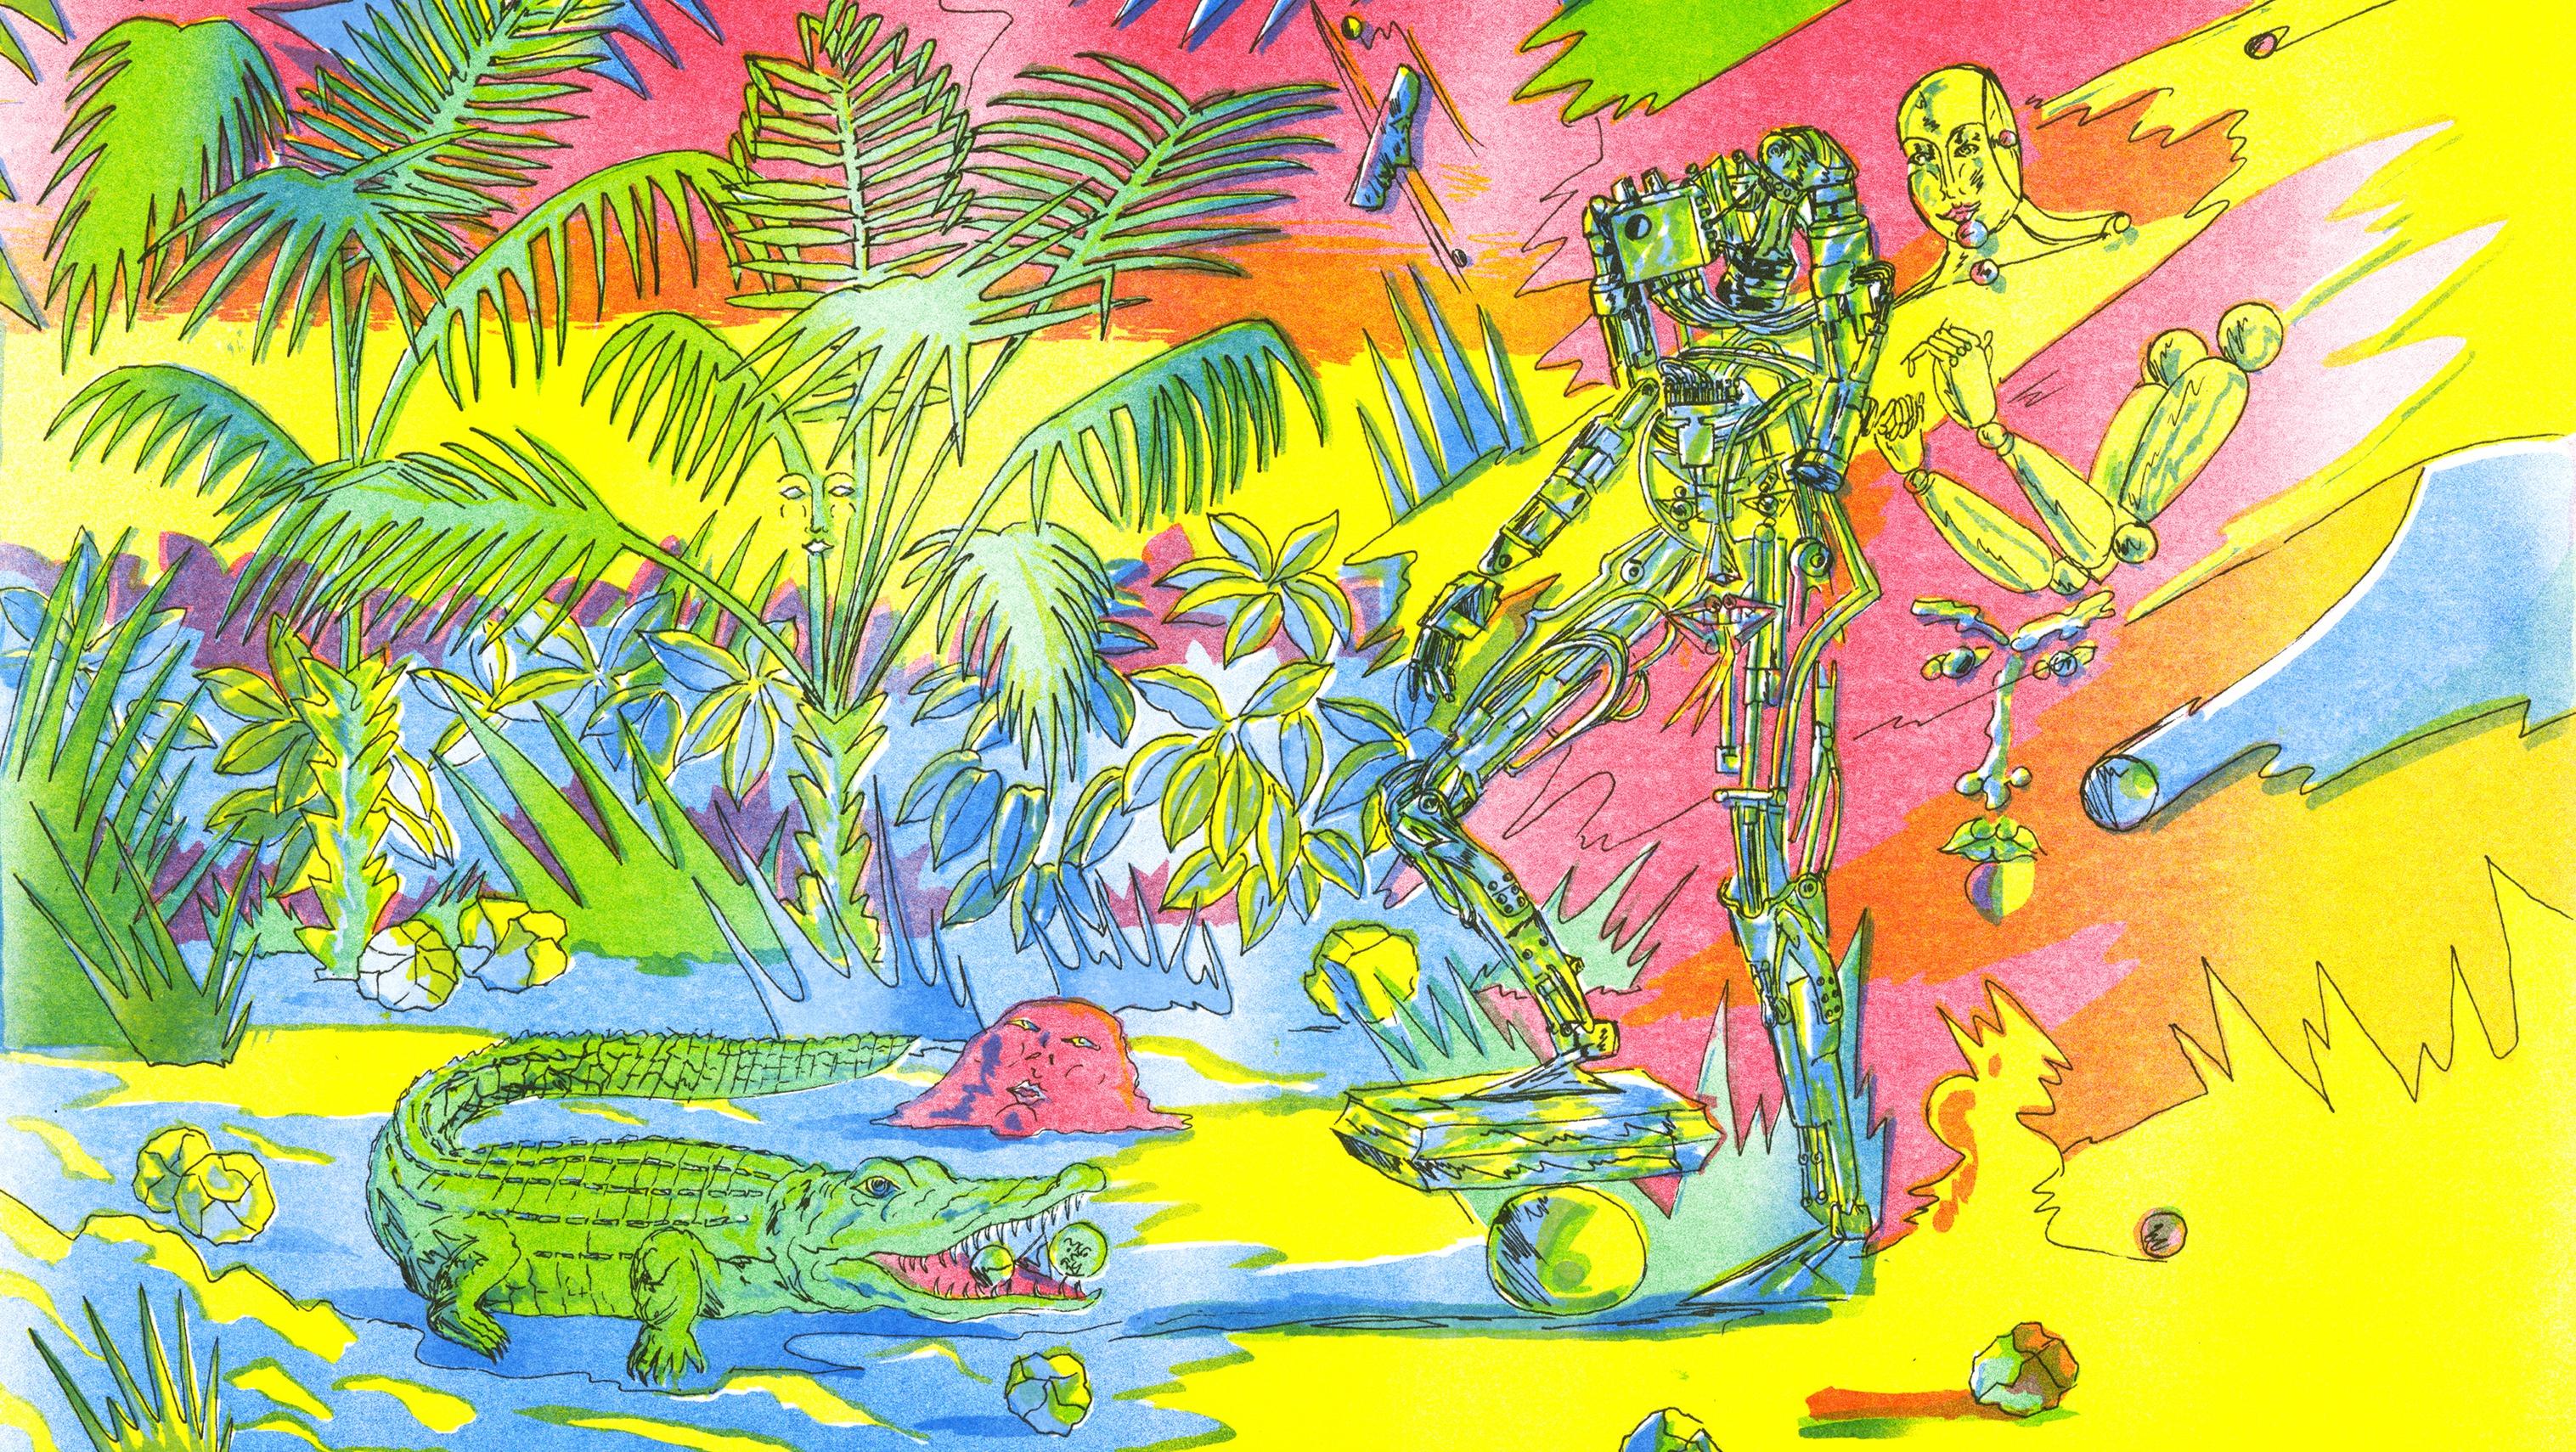 A surreal, colorful riso print